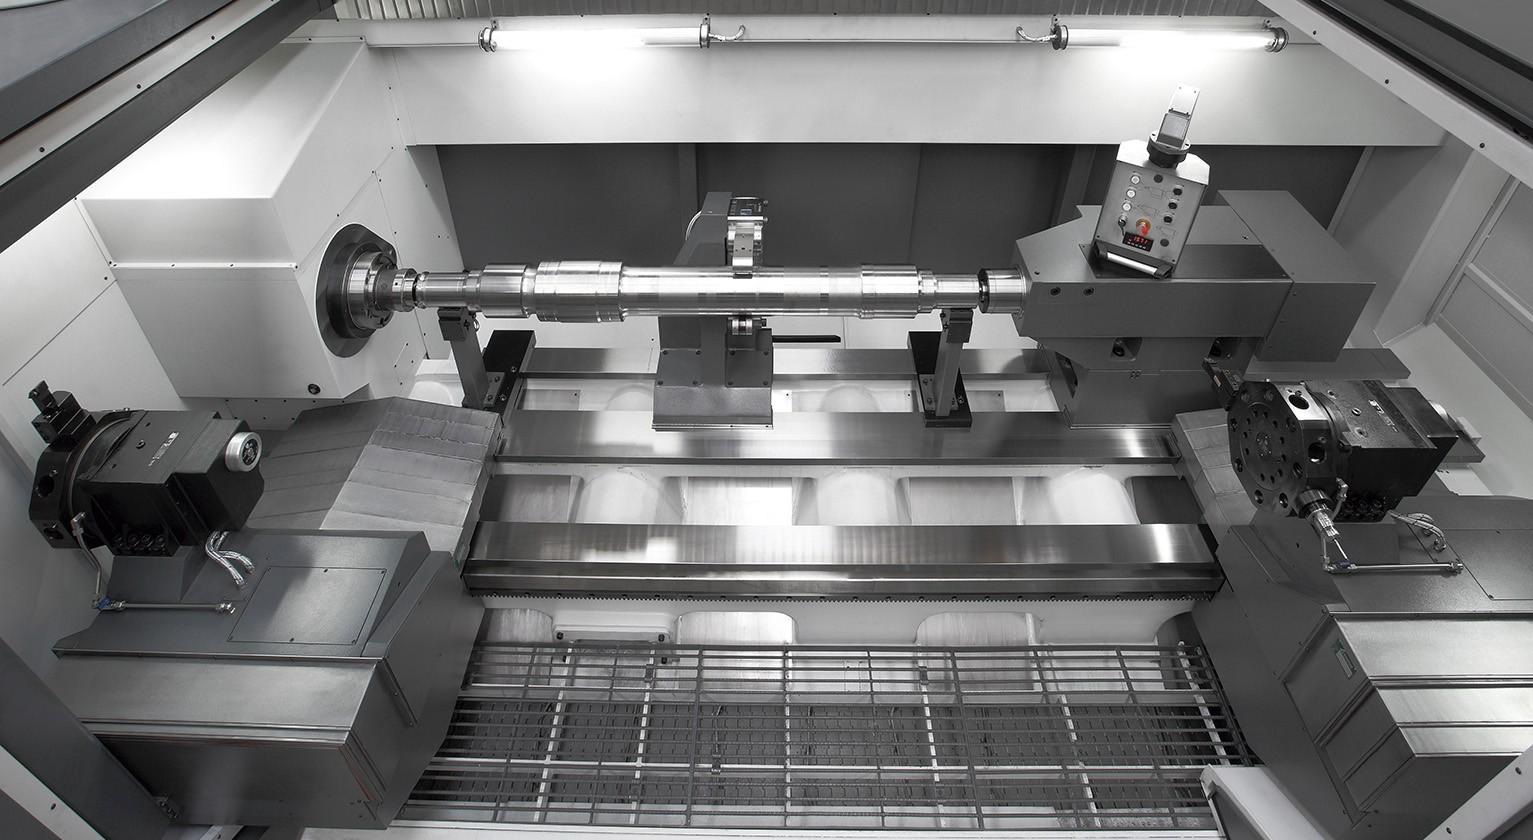 Galería tornos horizontales - foto 12 - Máquina Herramienta - Geminis Lathes